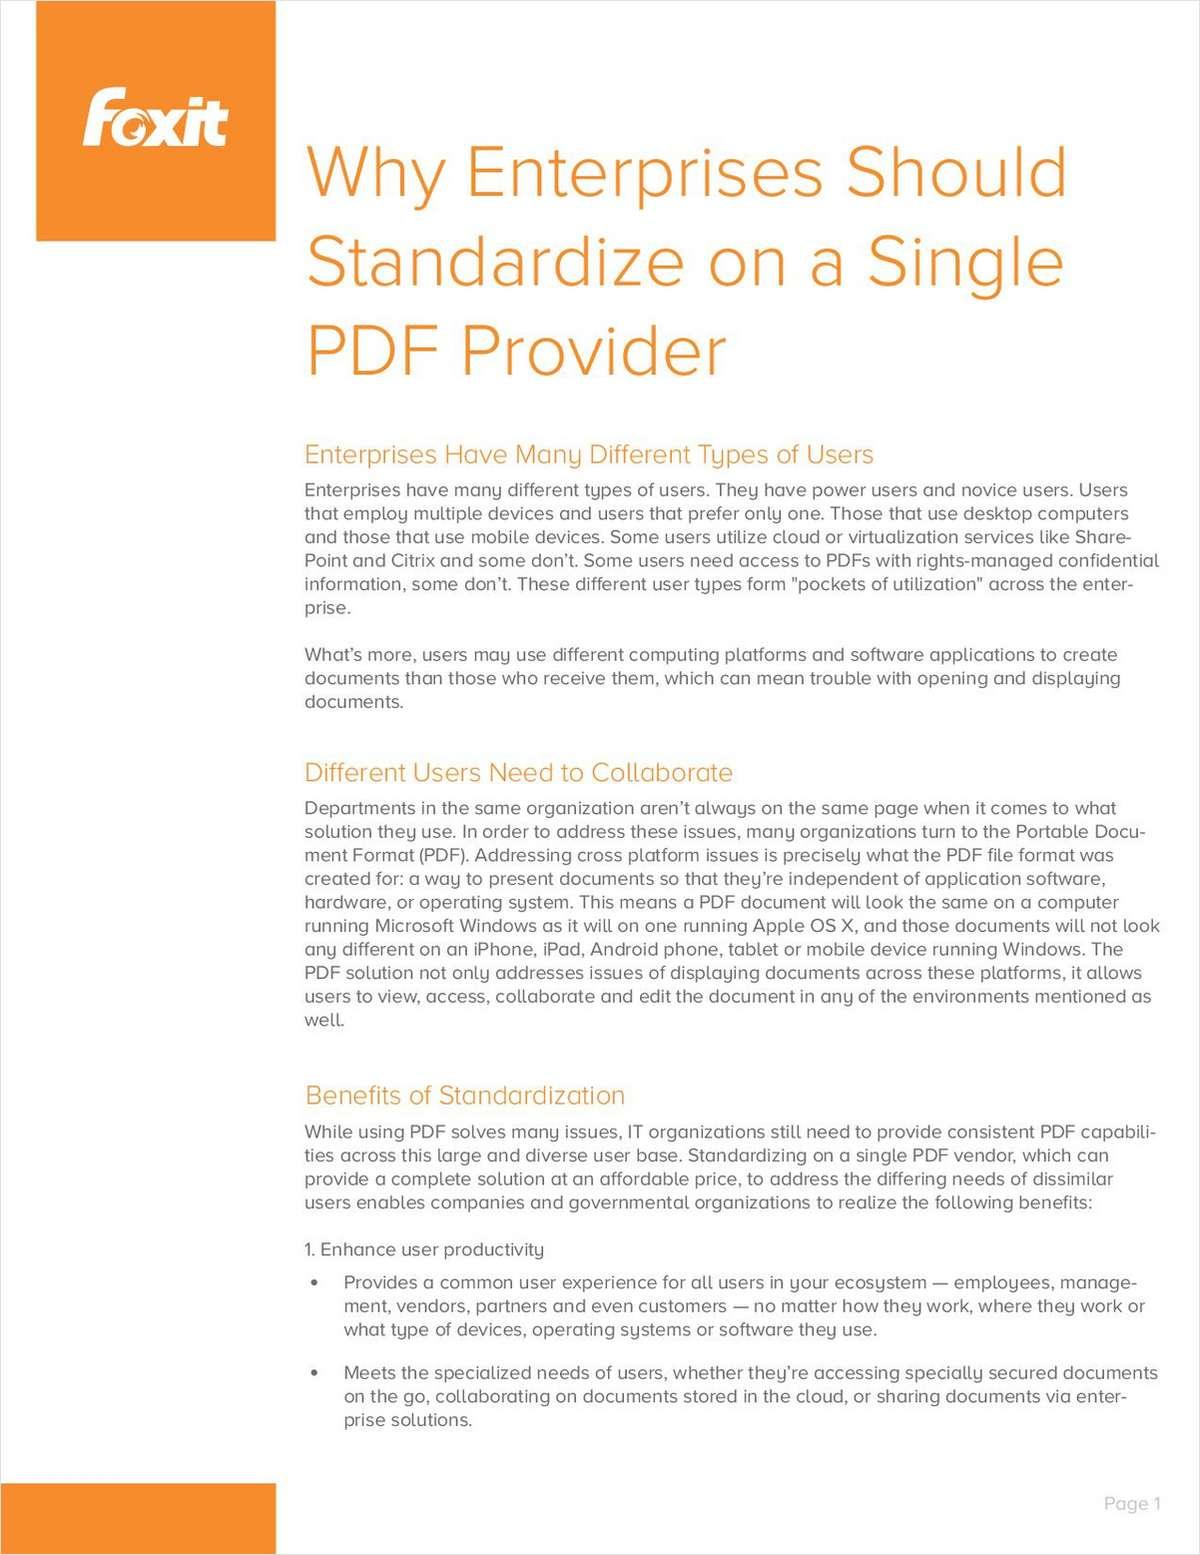 Why Enterprises Should Standardize on a Single PDF Provider